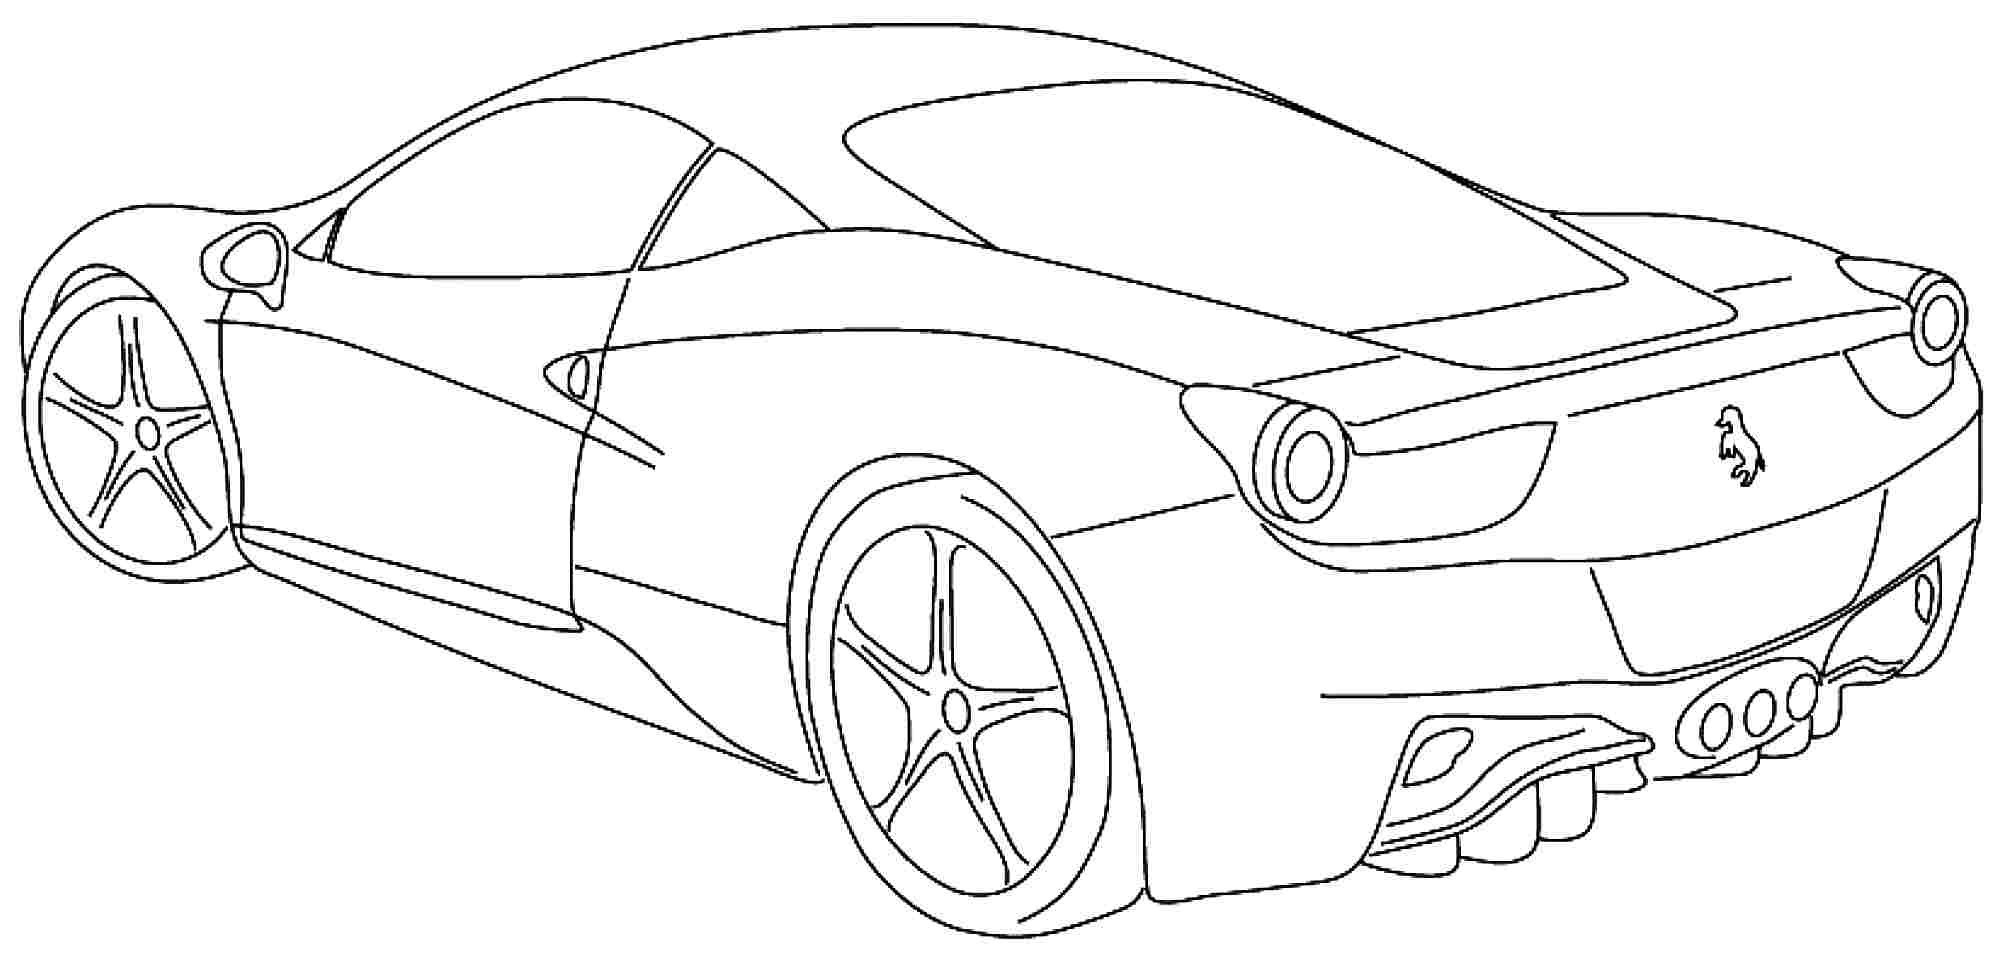 Ferrari Coloring Pages At Getdrawings Free Download